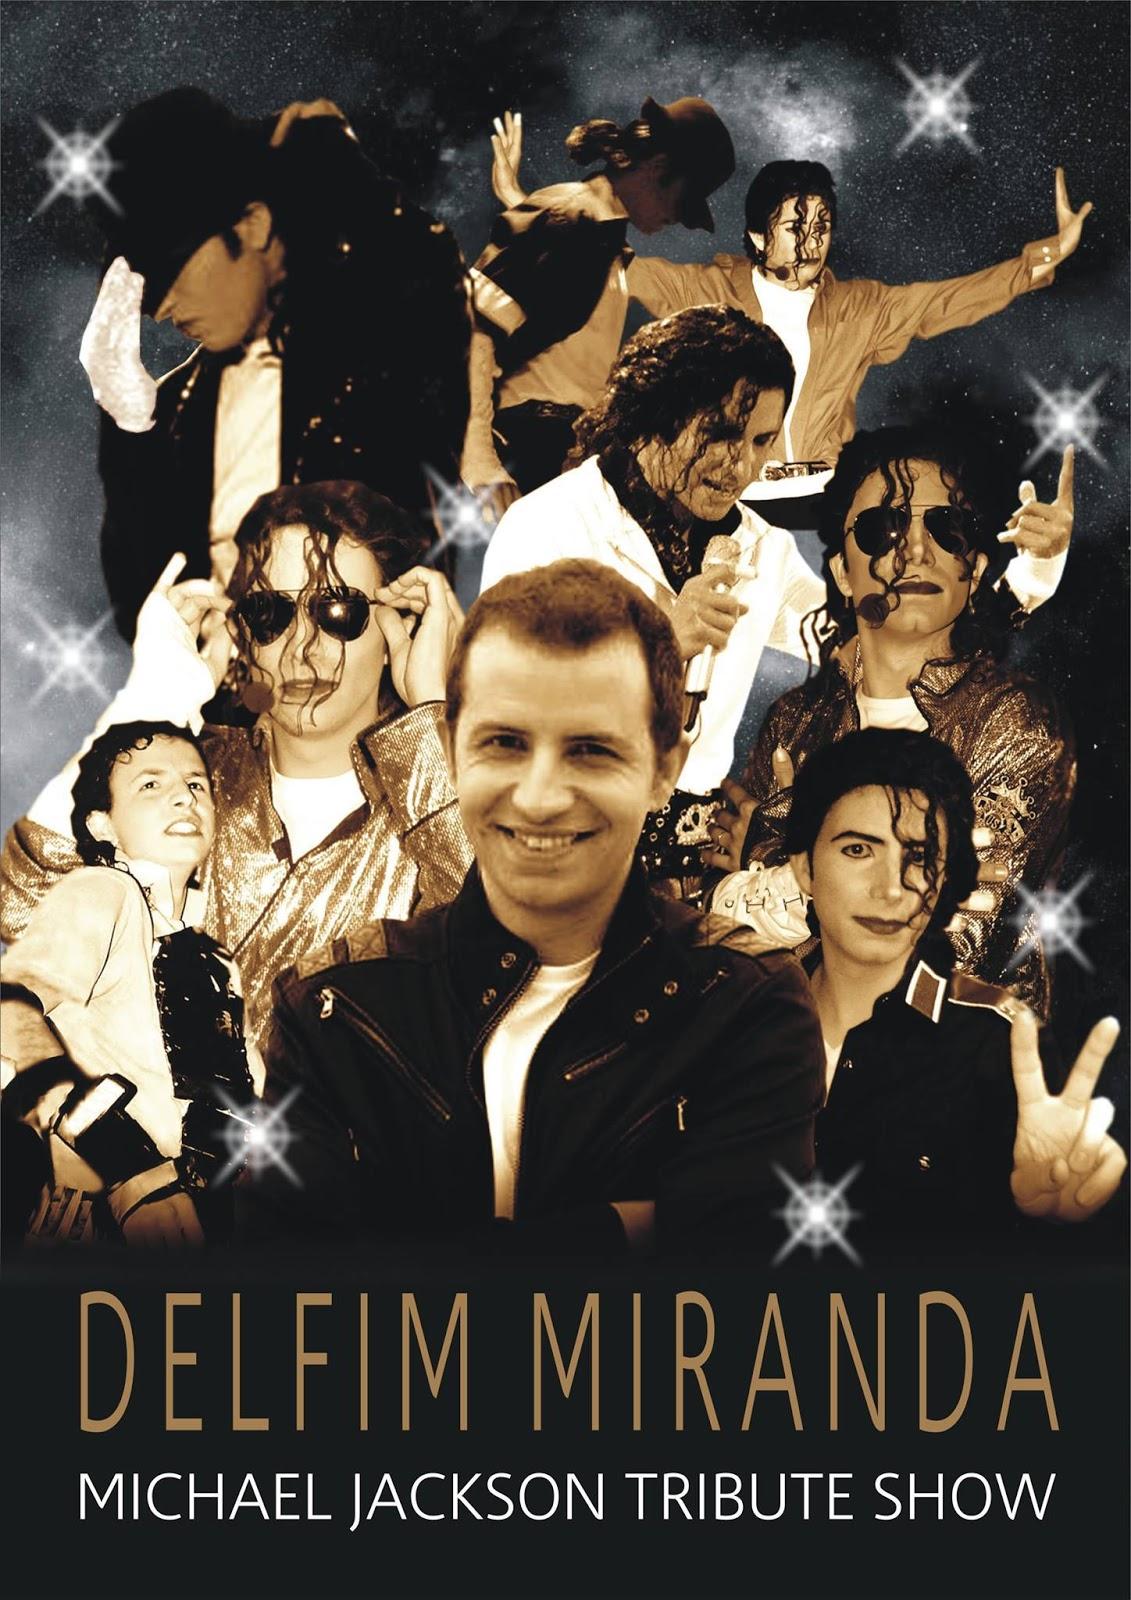 Delfim Miranda - Michael Jackson Tribute Show - Poster by Rui Duarte